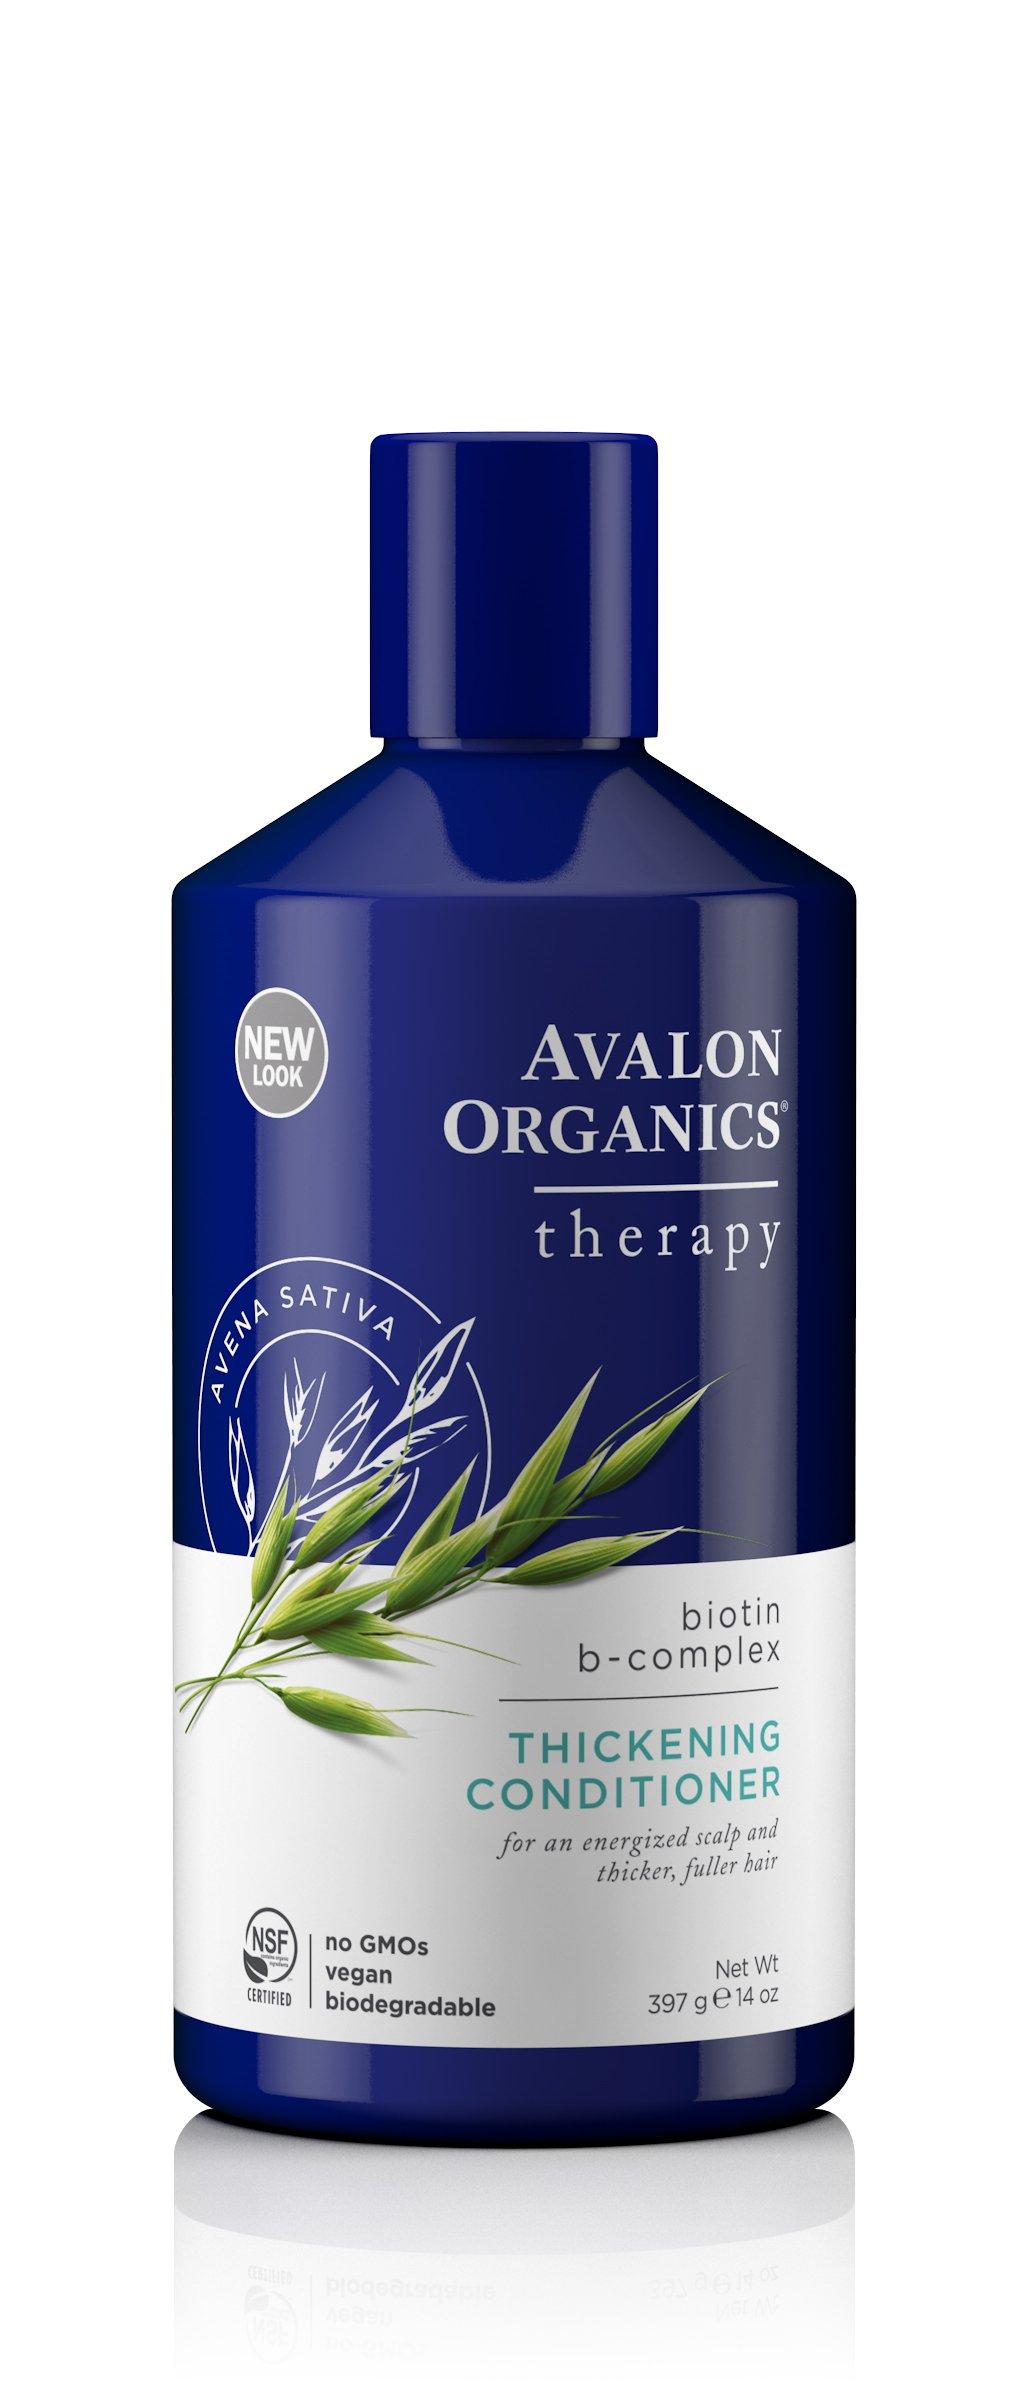 Avalon Organics Biotin B-Complex Thickening Conditioner, 14 Ounce